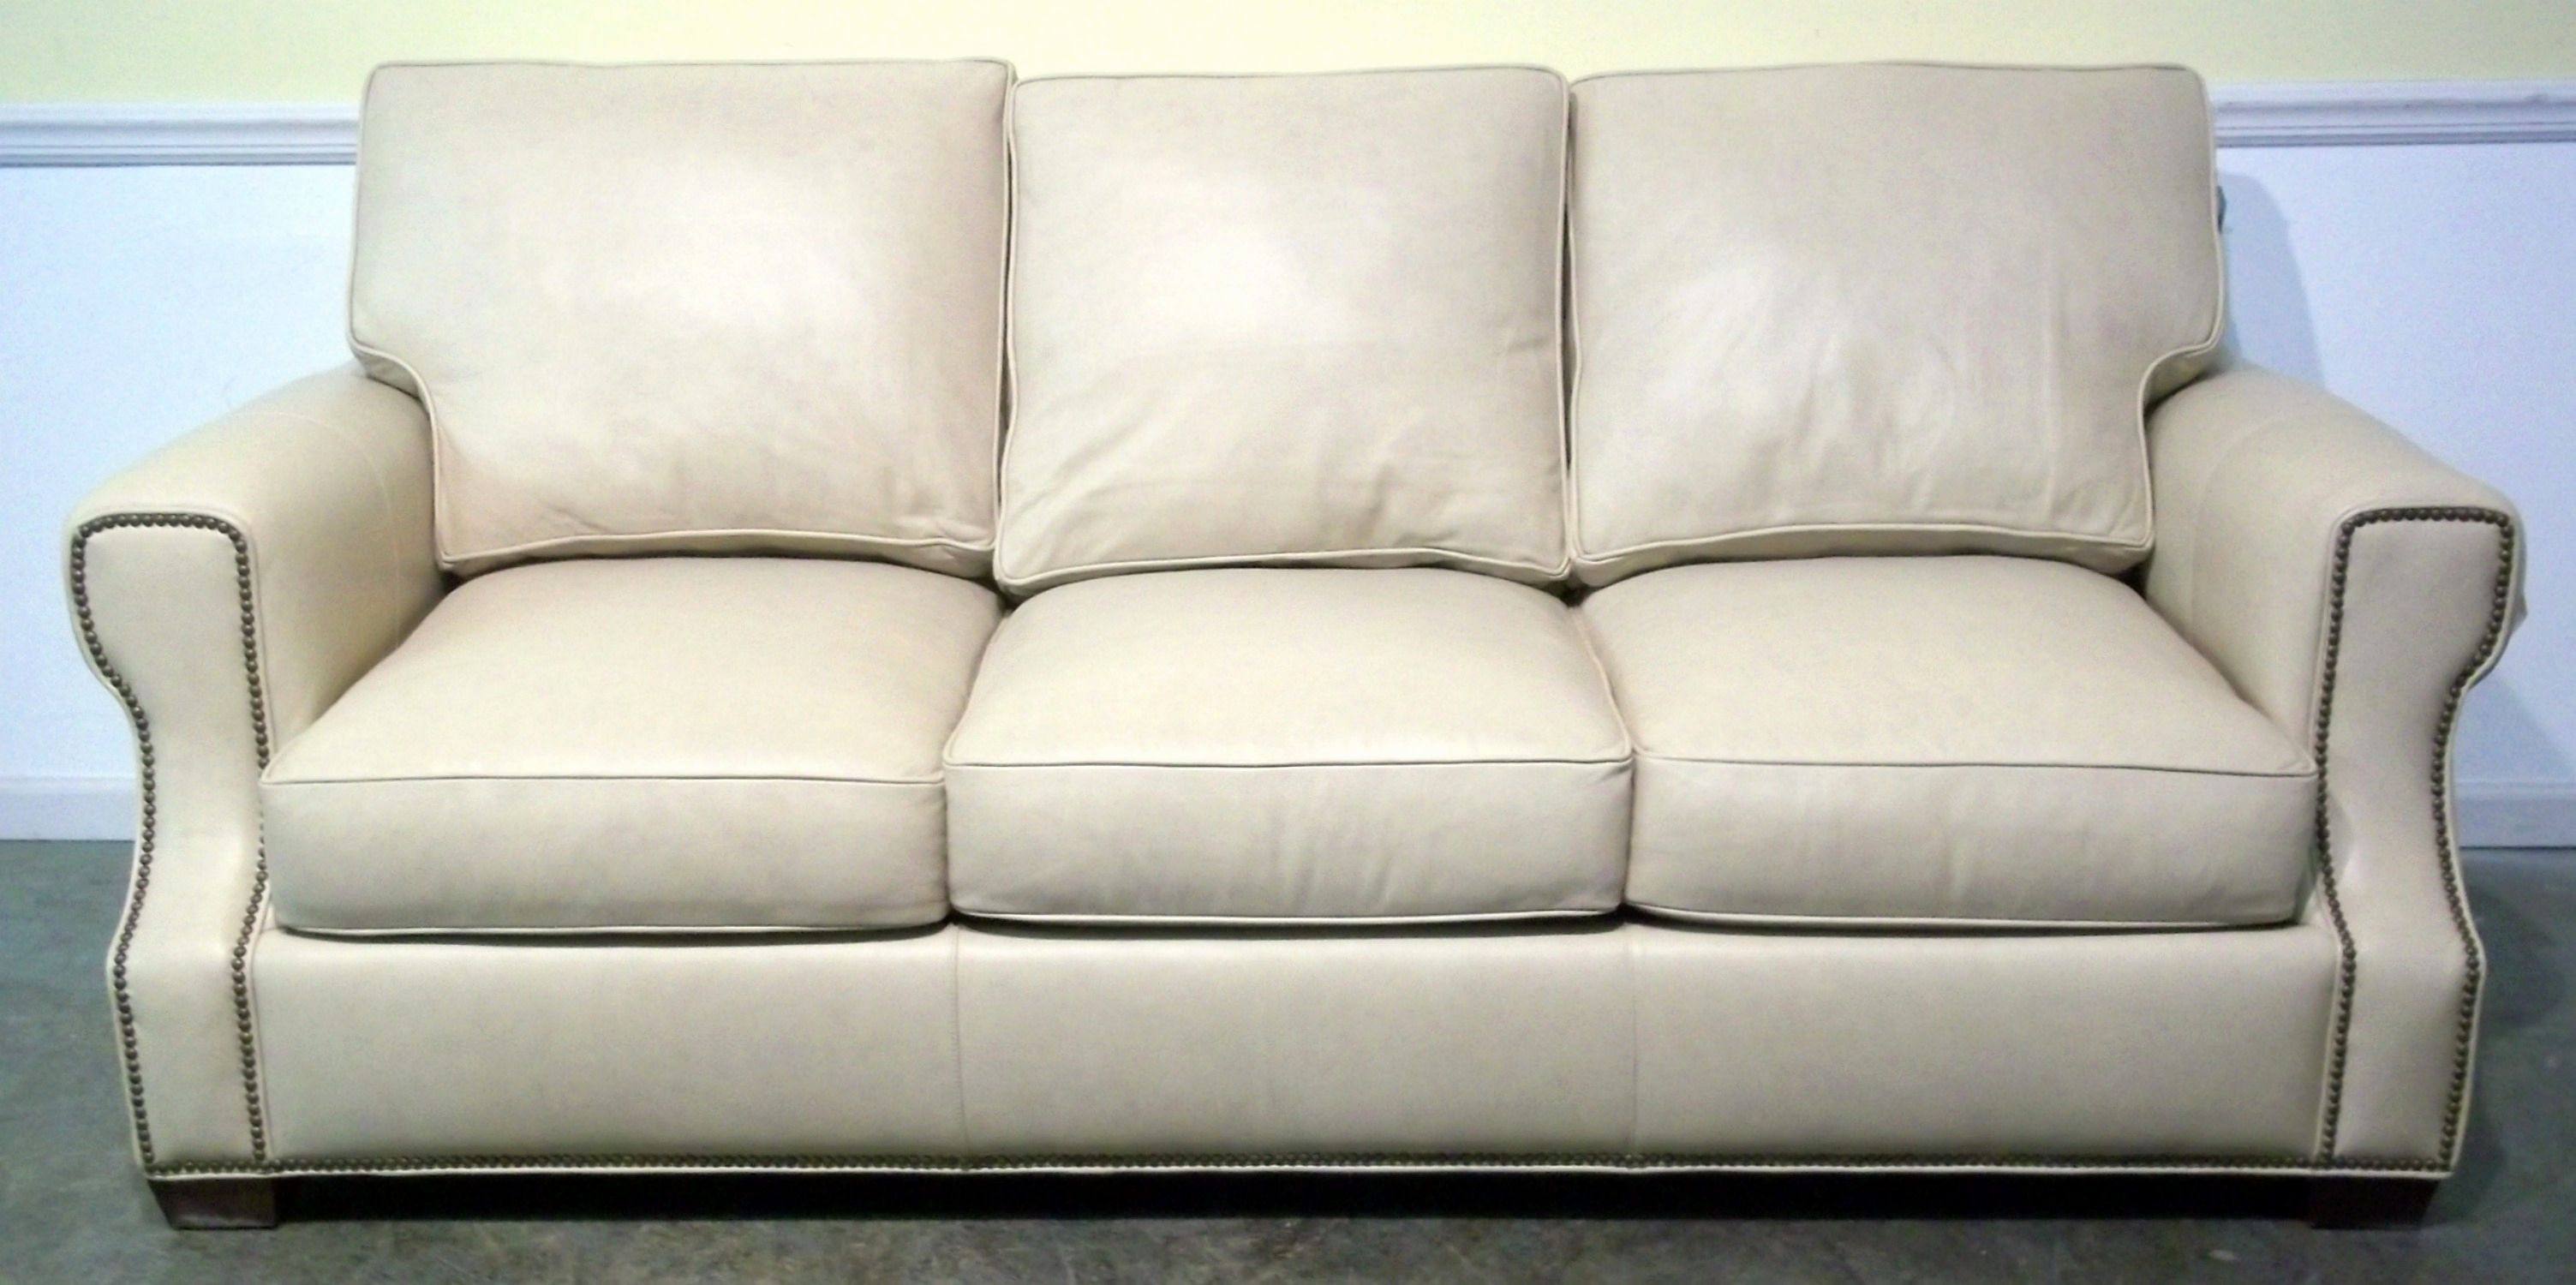 fresh cream colored leather sofa pics